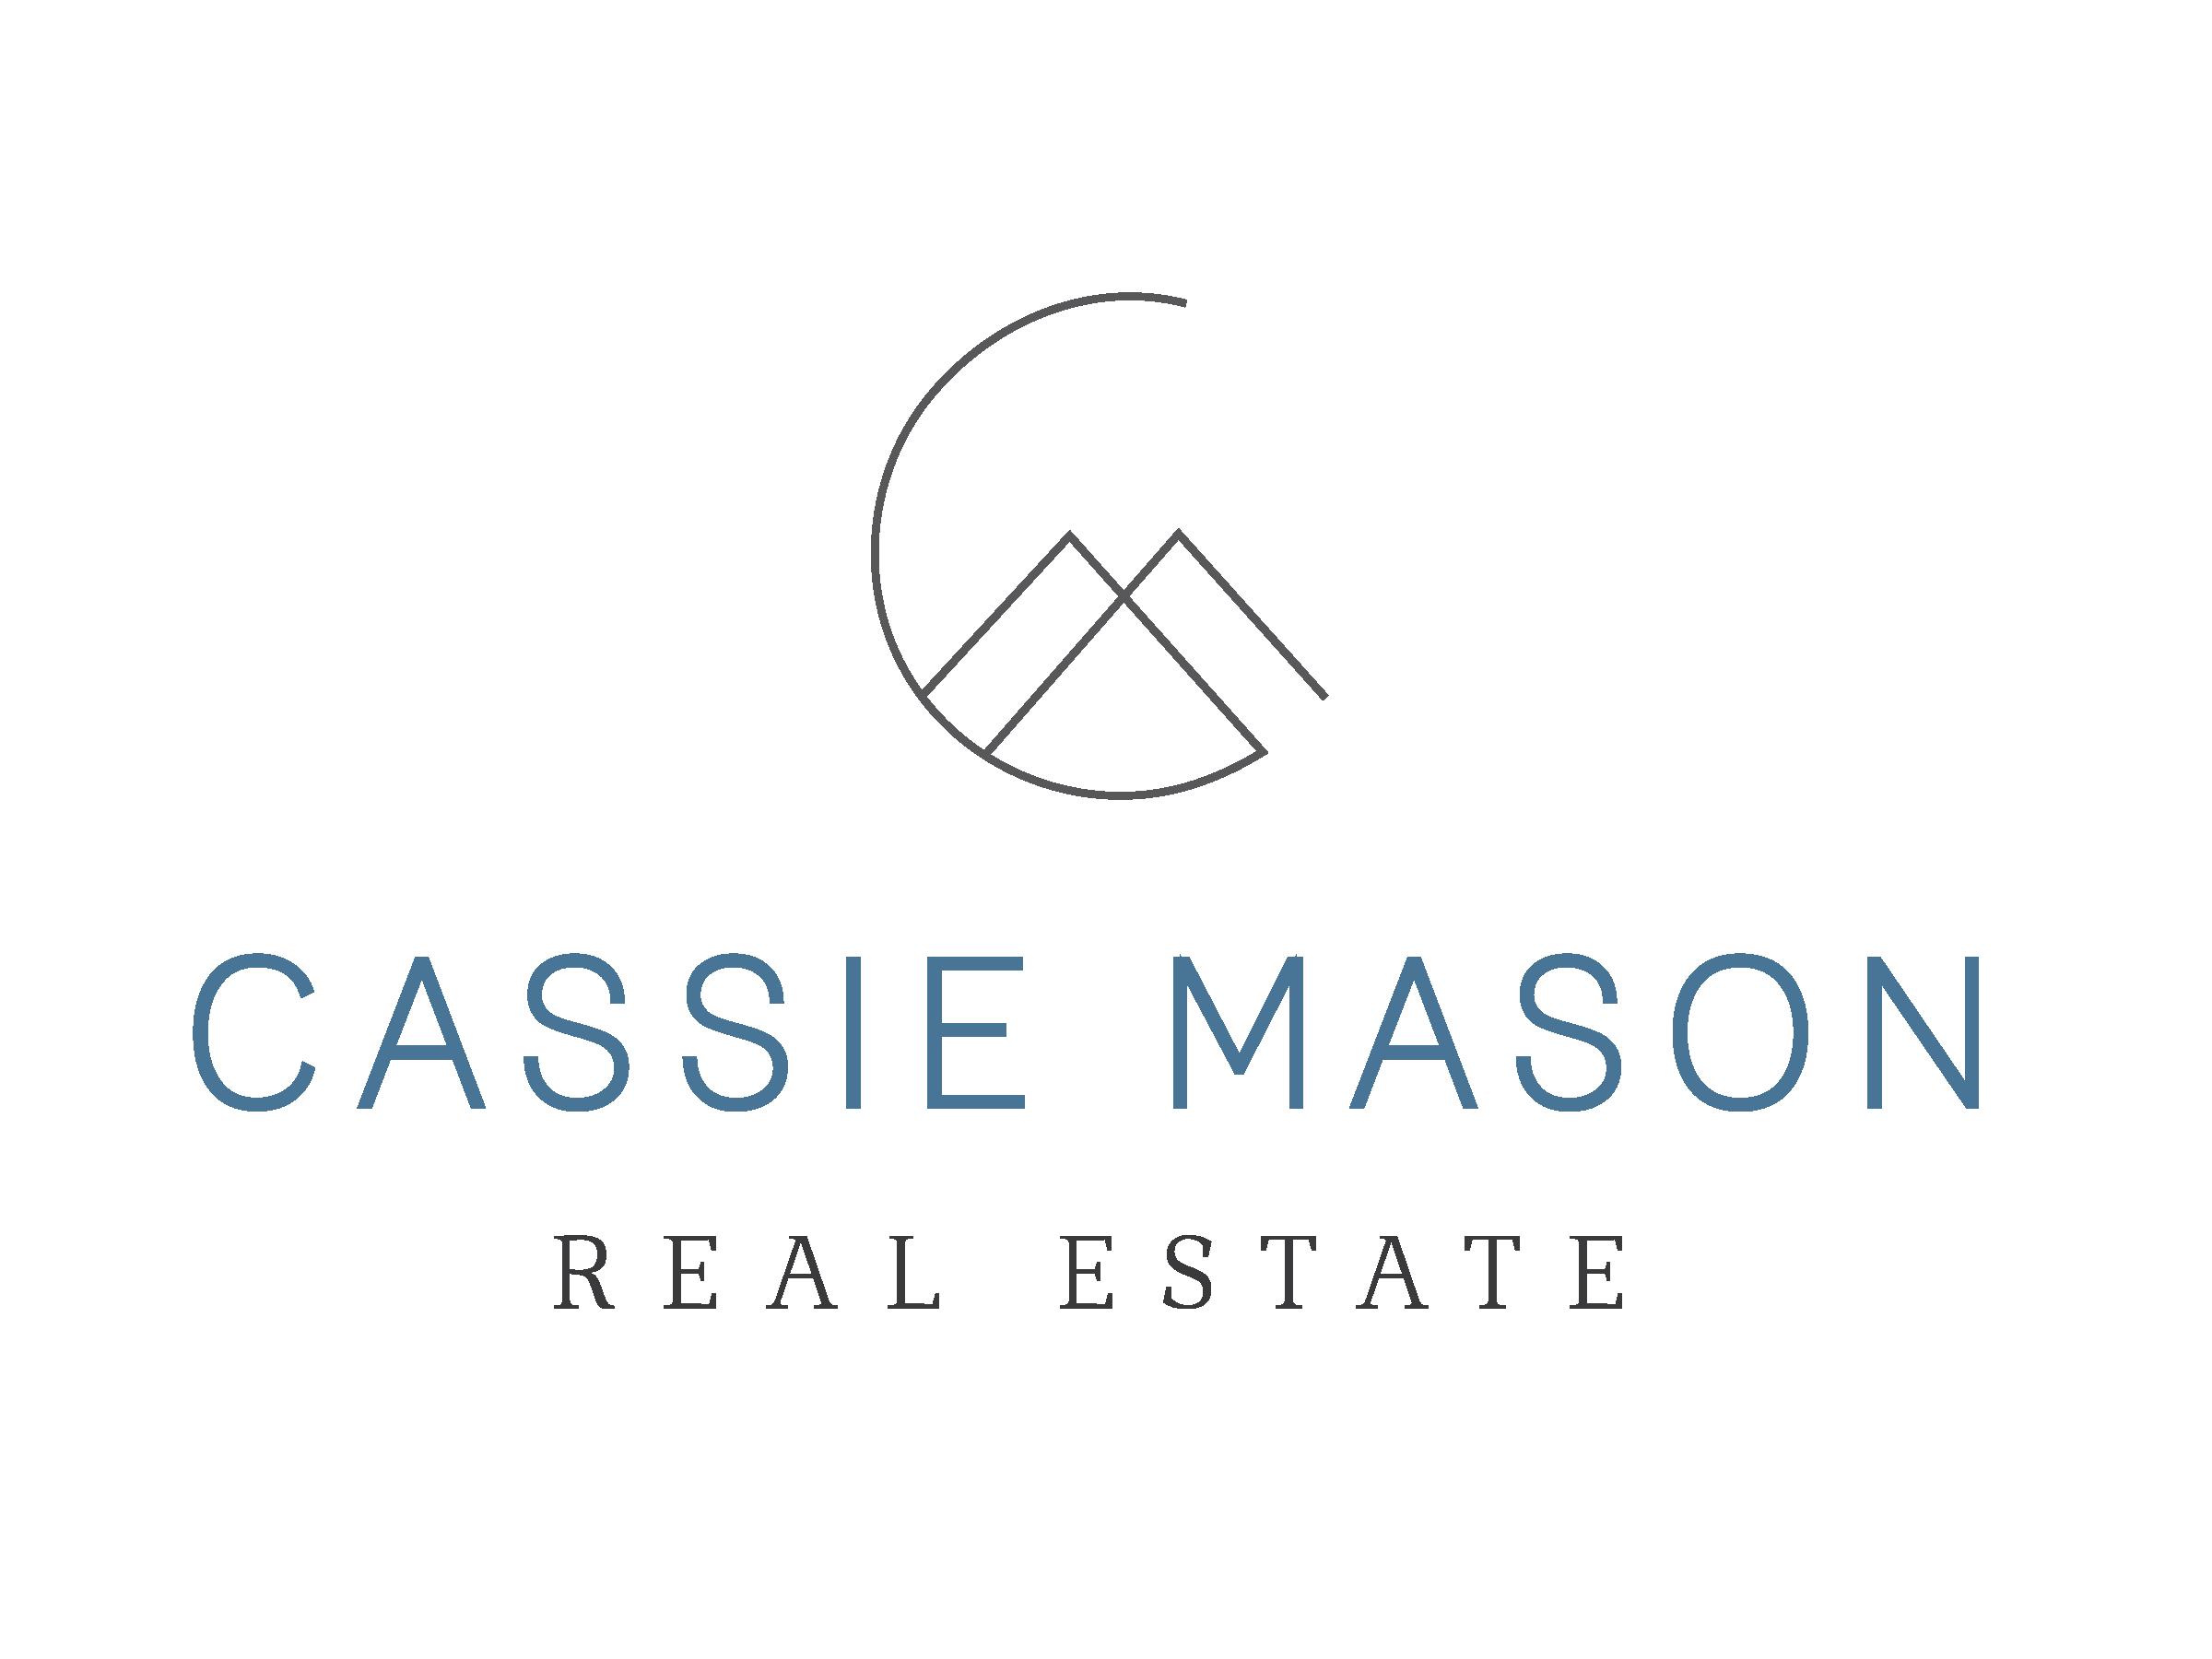 Cassie Mason Real Estate